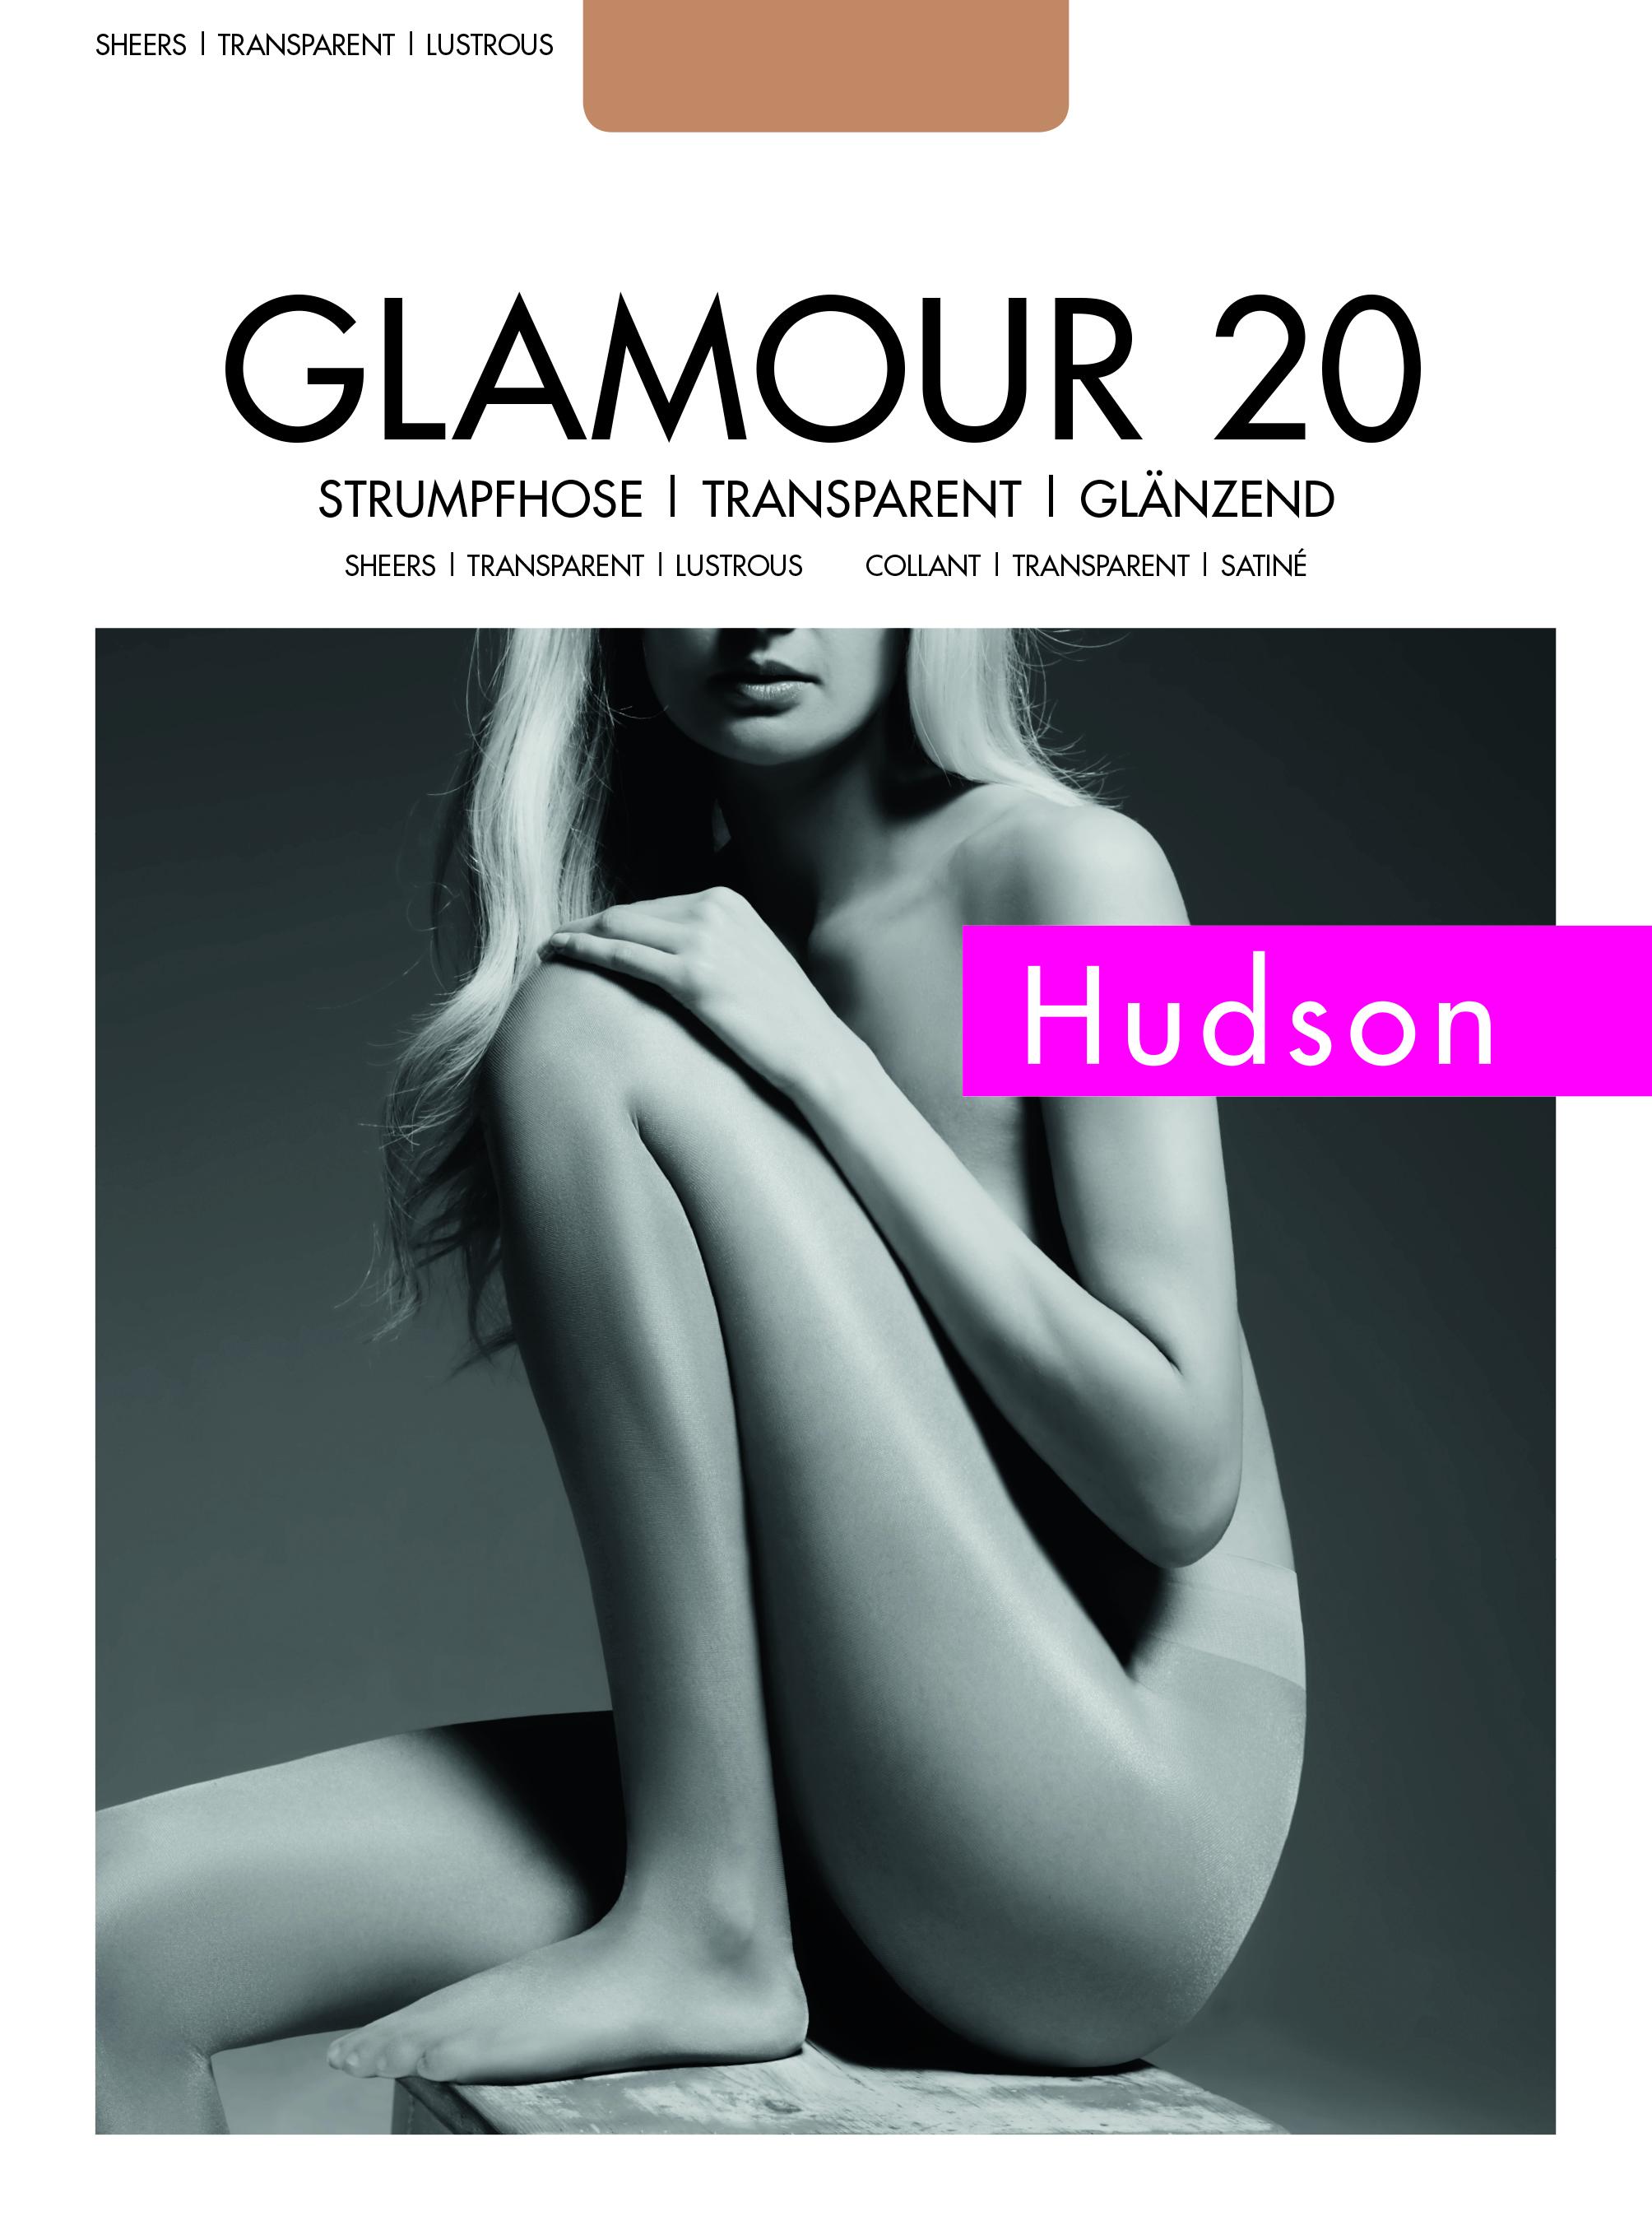 dcfaba310a676 Hudson - Sheer, shiny tights Glamour 20 ✅